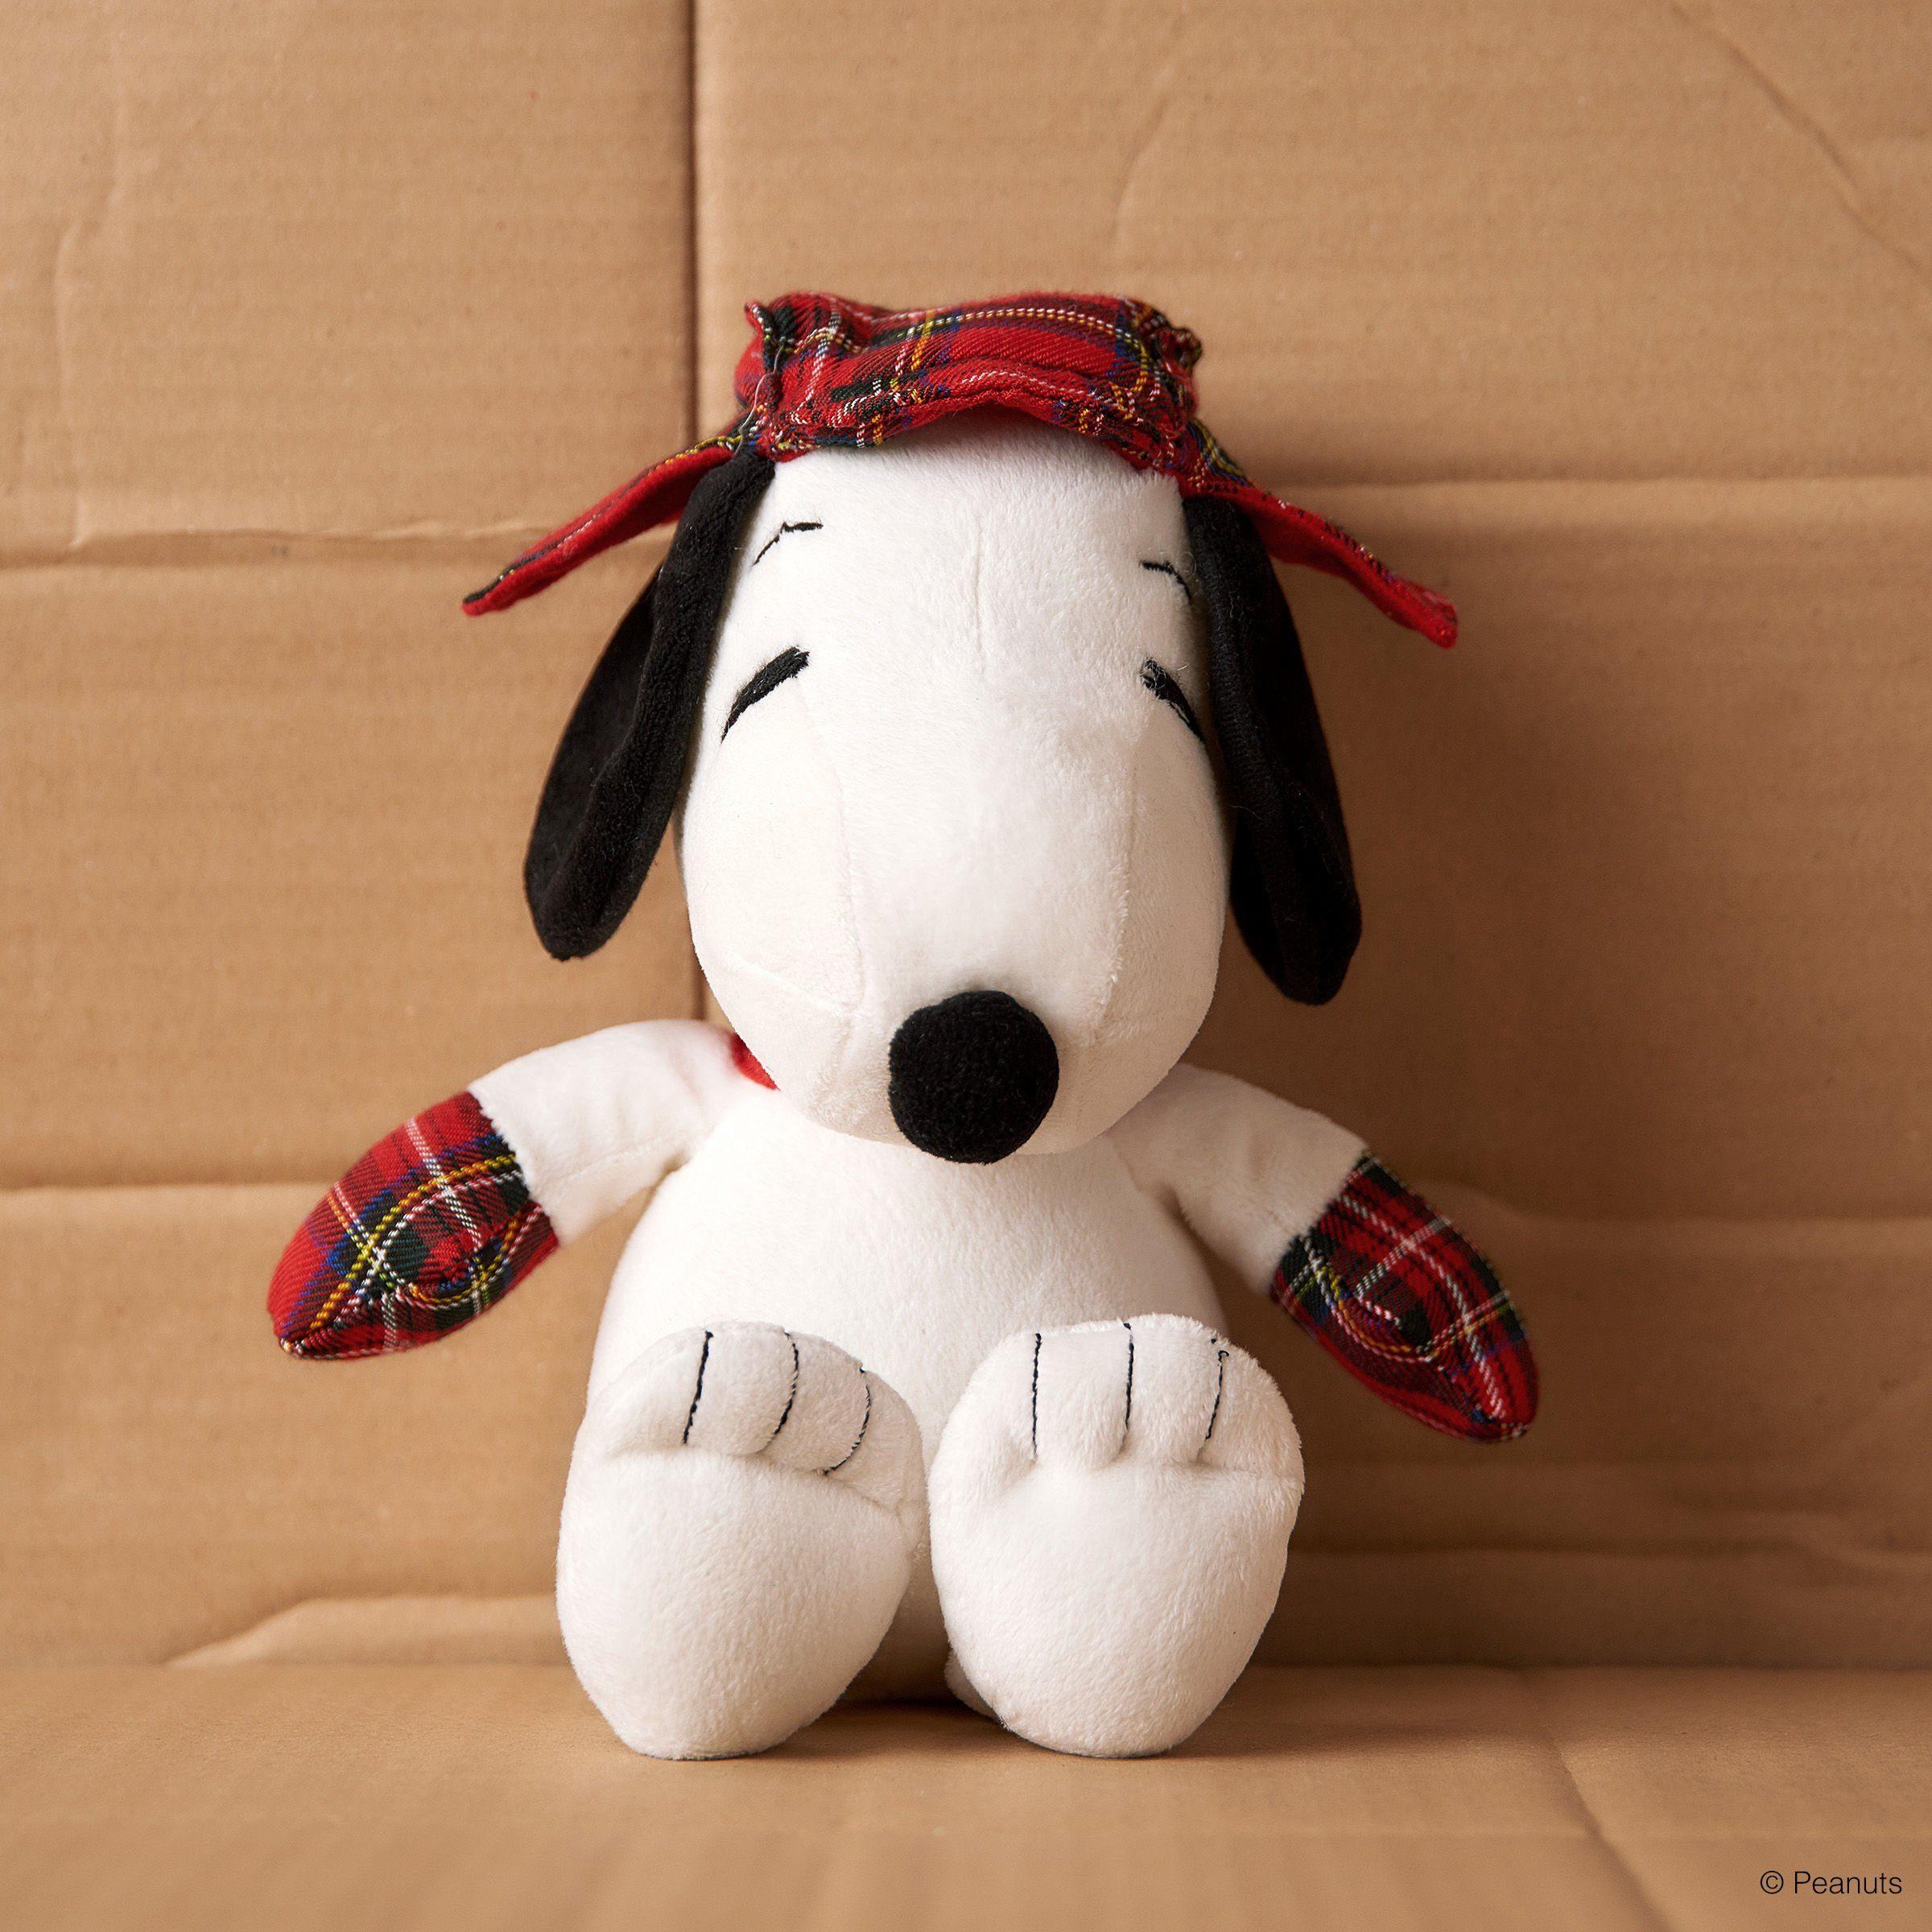 BUTLERS PEANUTS »Schotten Snoopy«